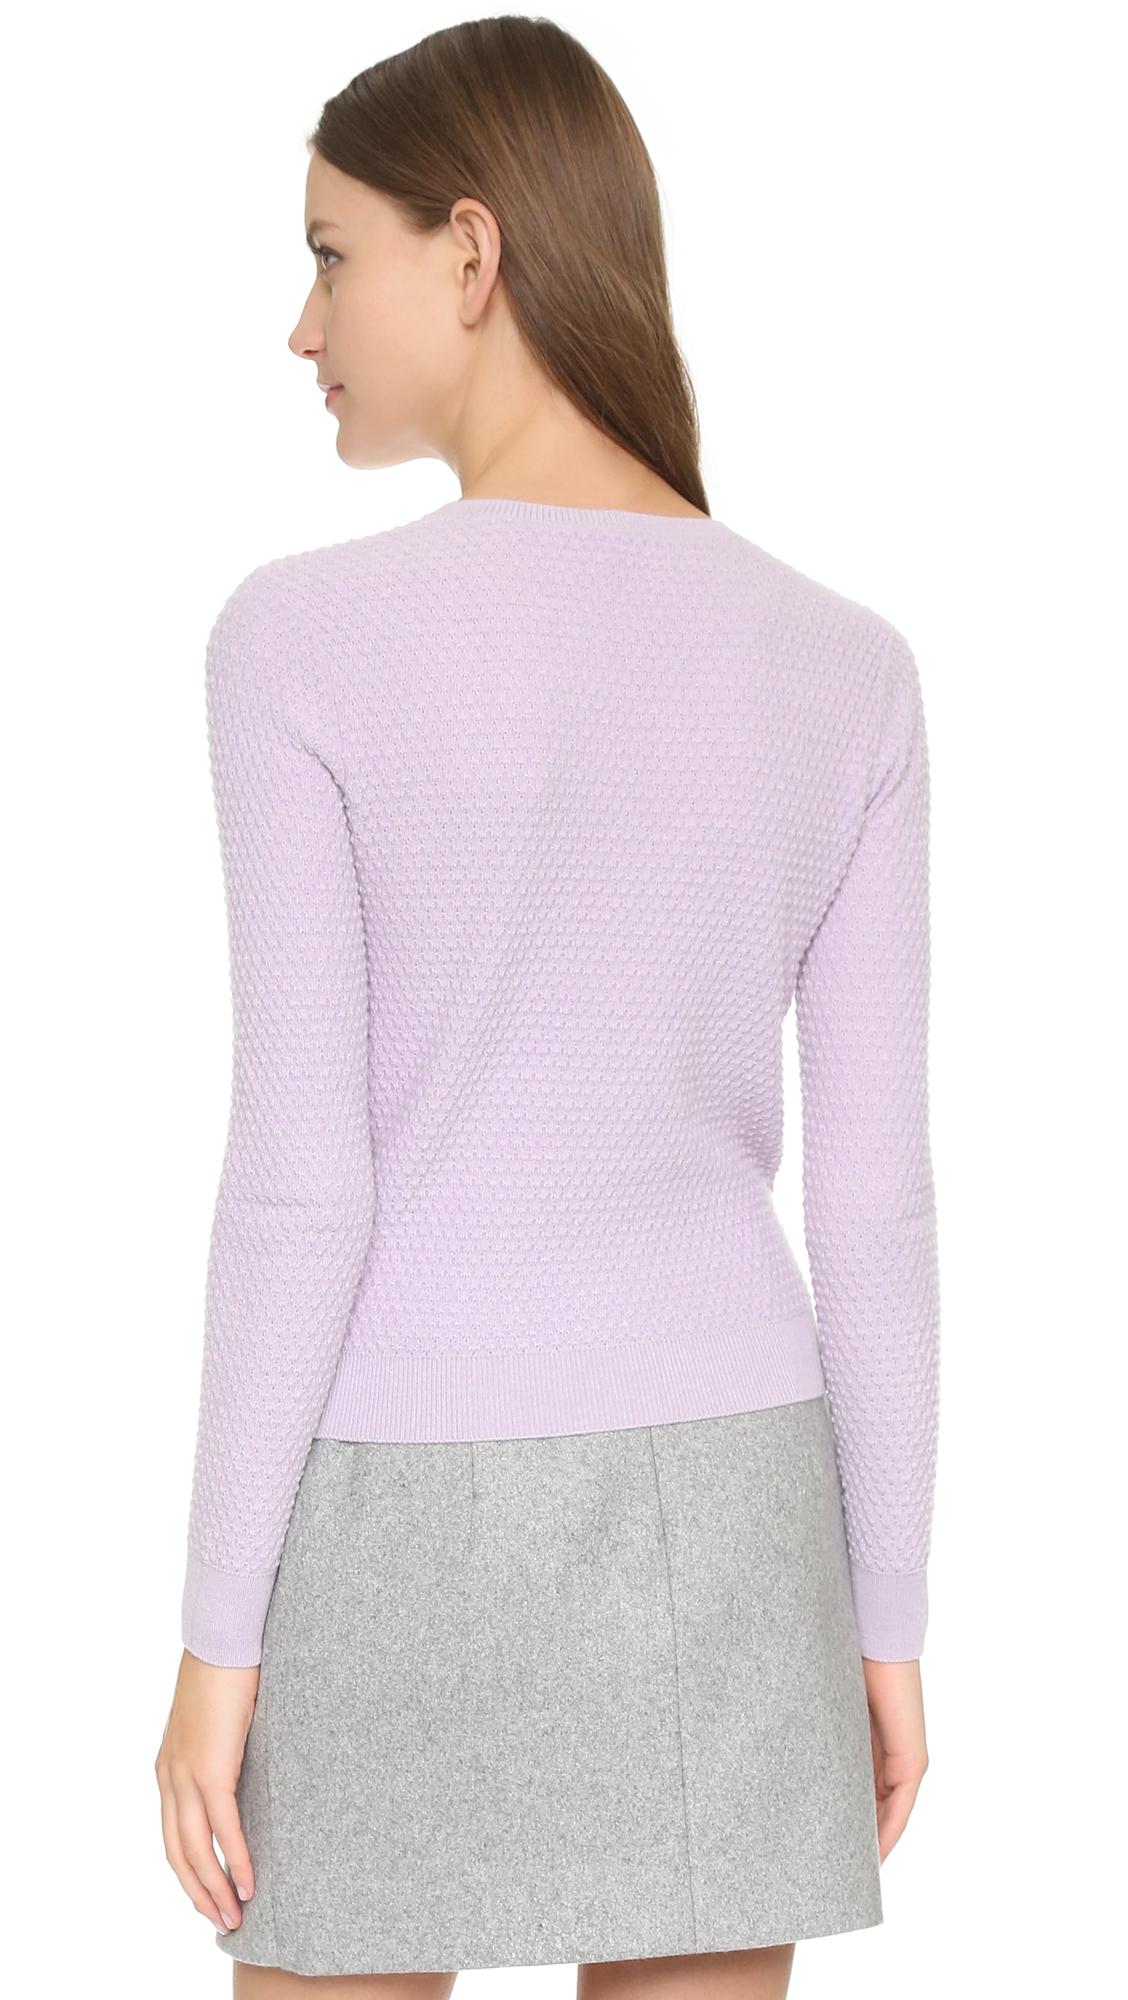 Carven Long Sleeve Sweater - Lilac in Purple   Lyst